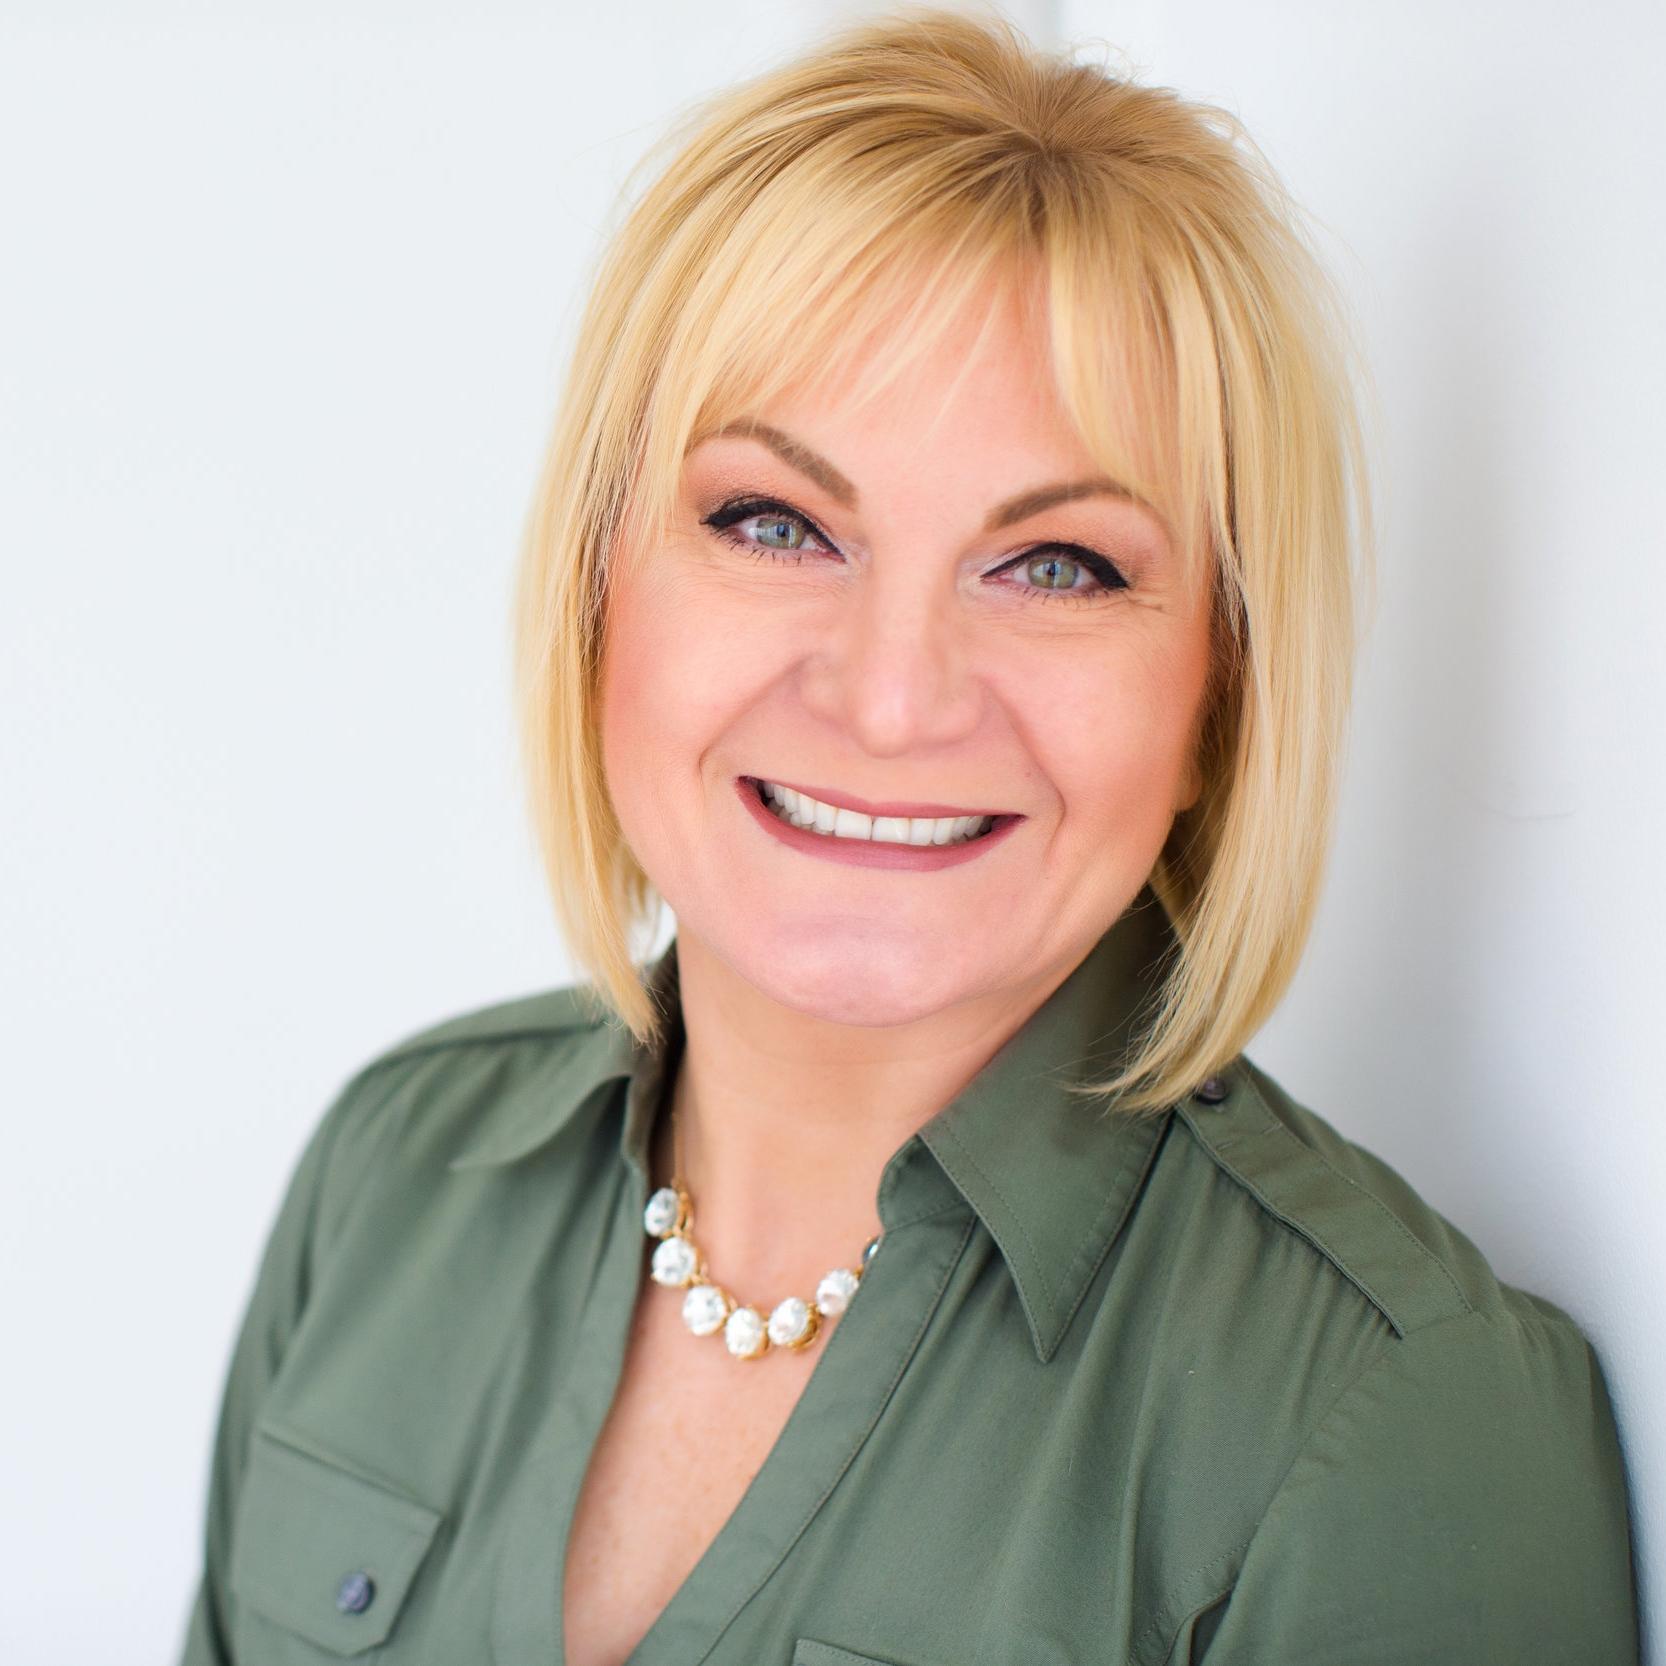 Annette Abell | Age: 45 | President, Business Owner